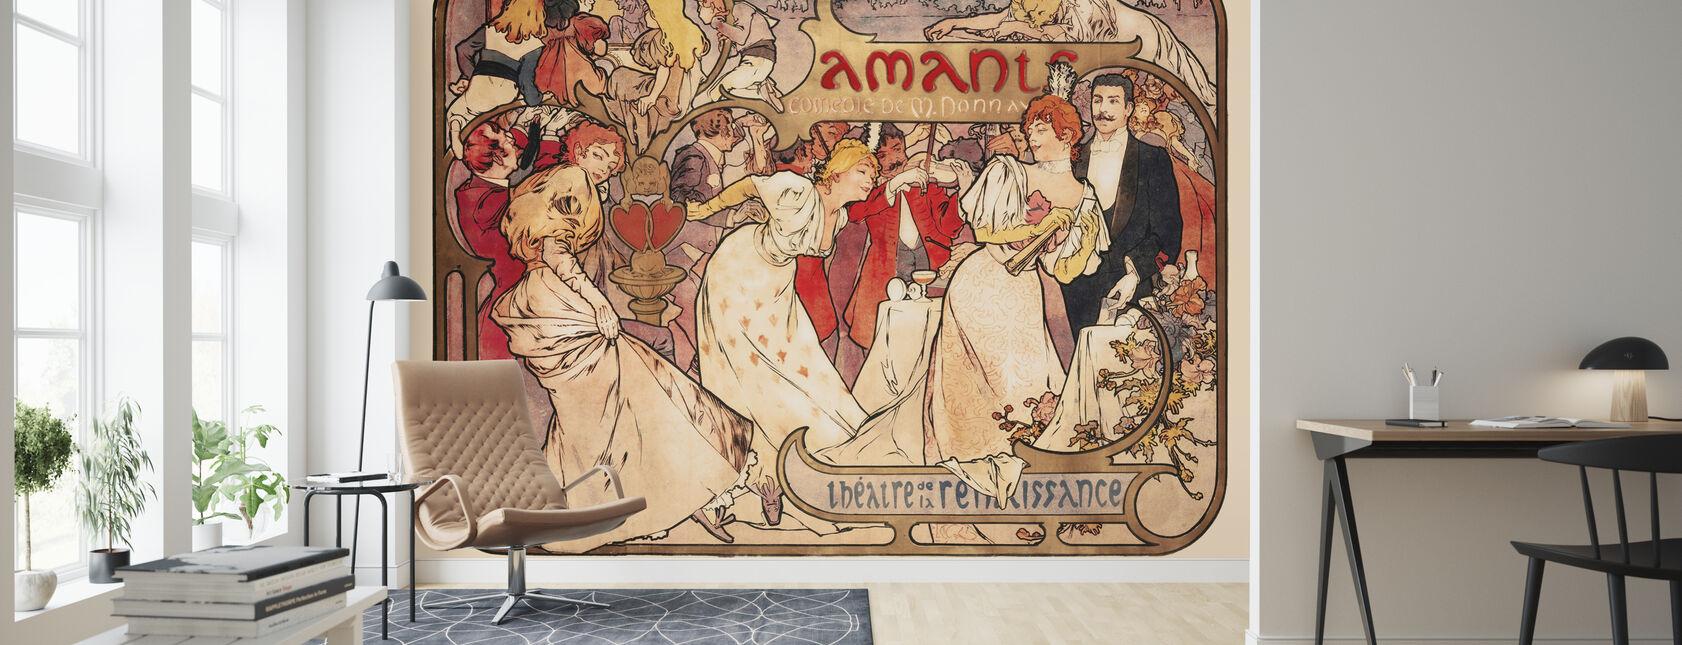 Alphonse Mucha - Amants Colour Litho - Wallpaper - Living Room